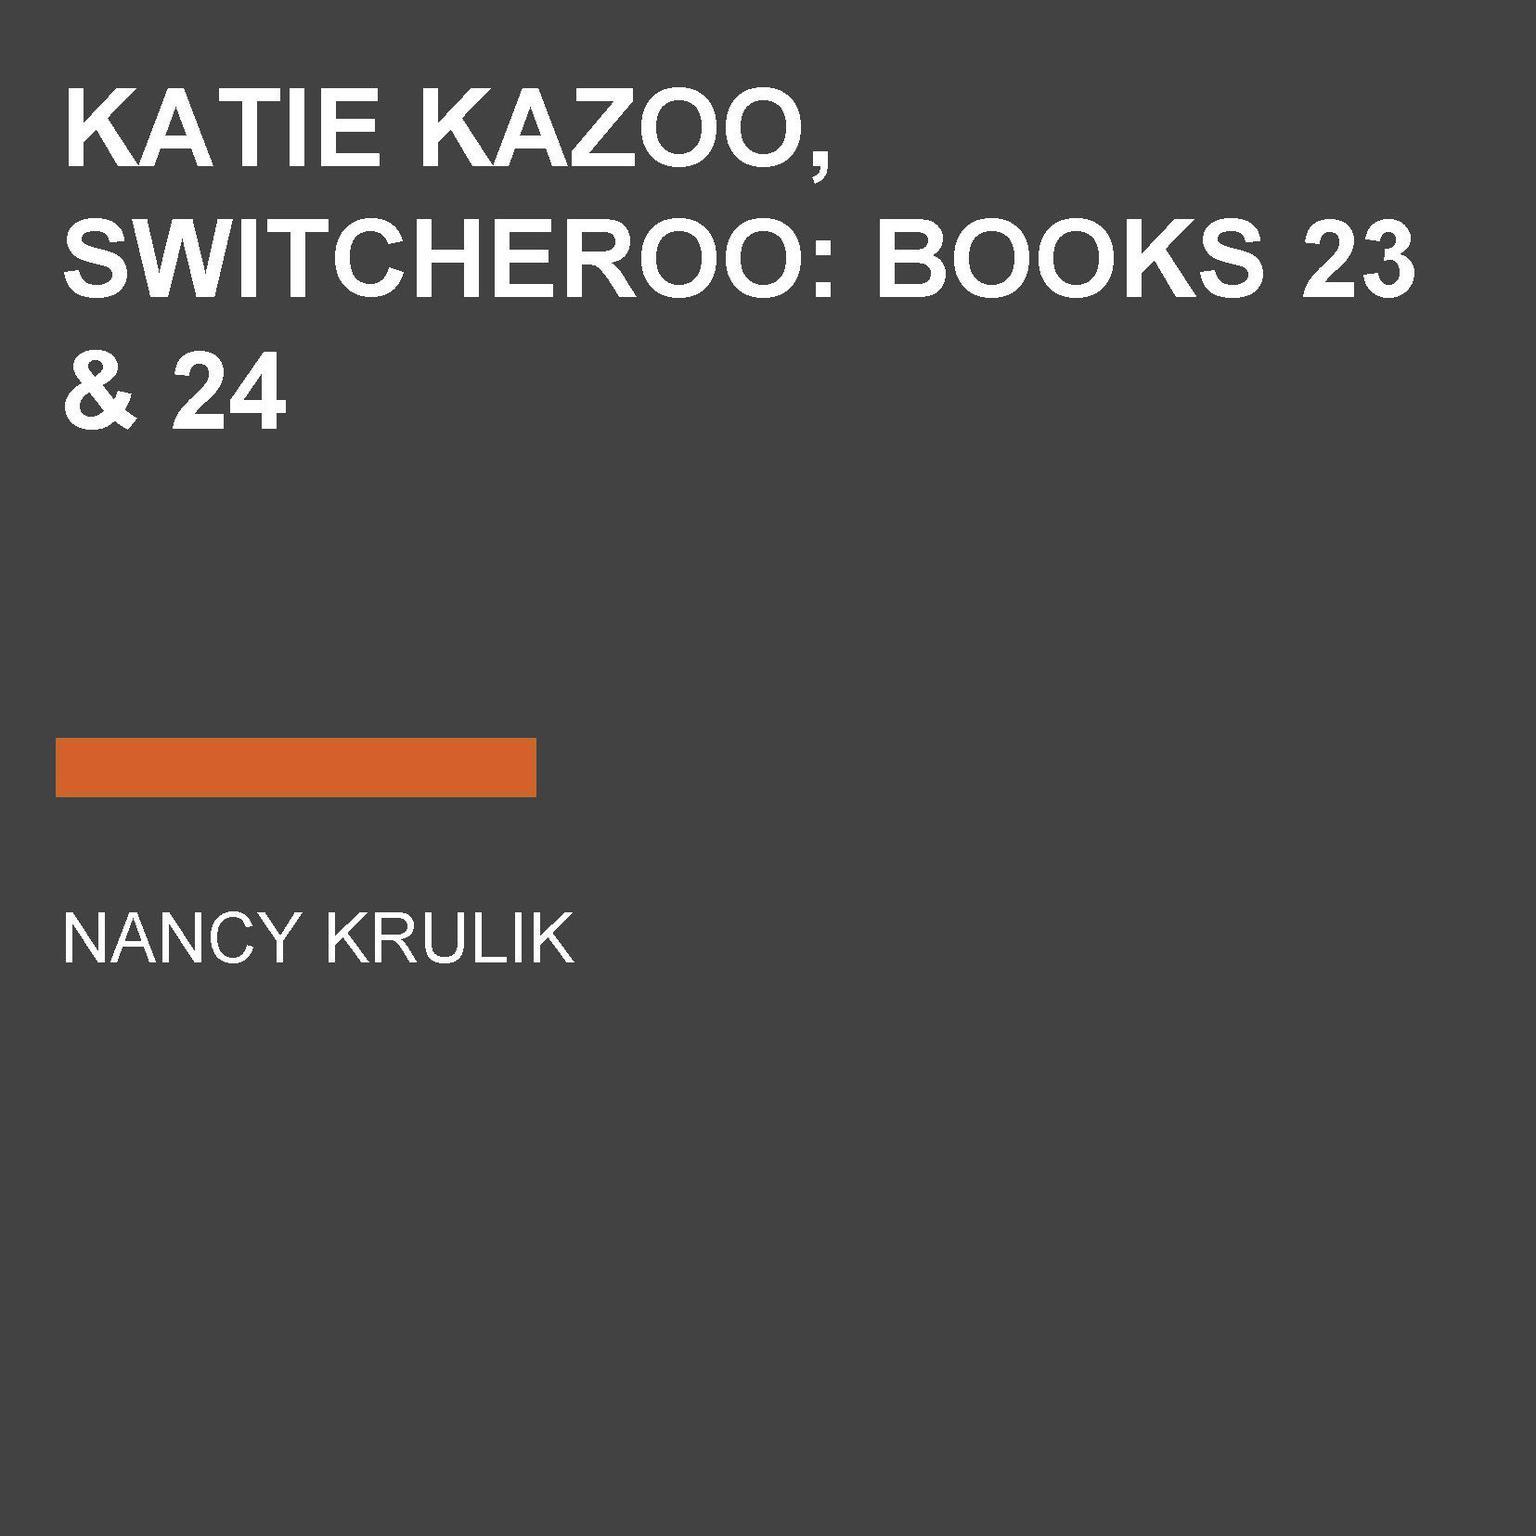 Katie Kazoo, Switcheroo: Books 23 & 24 Audiobook, by Nancy Krulik